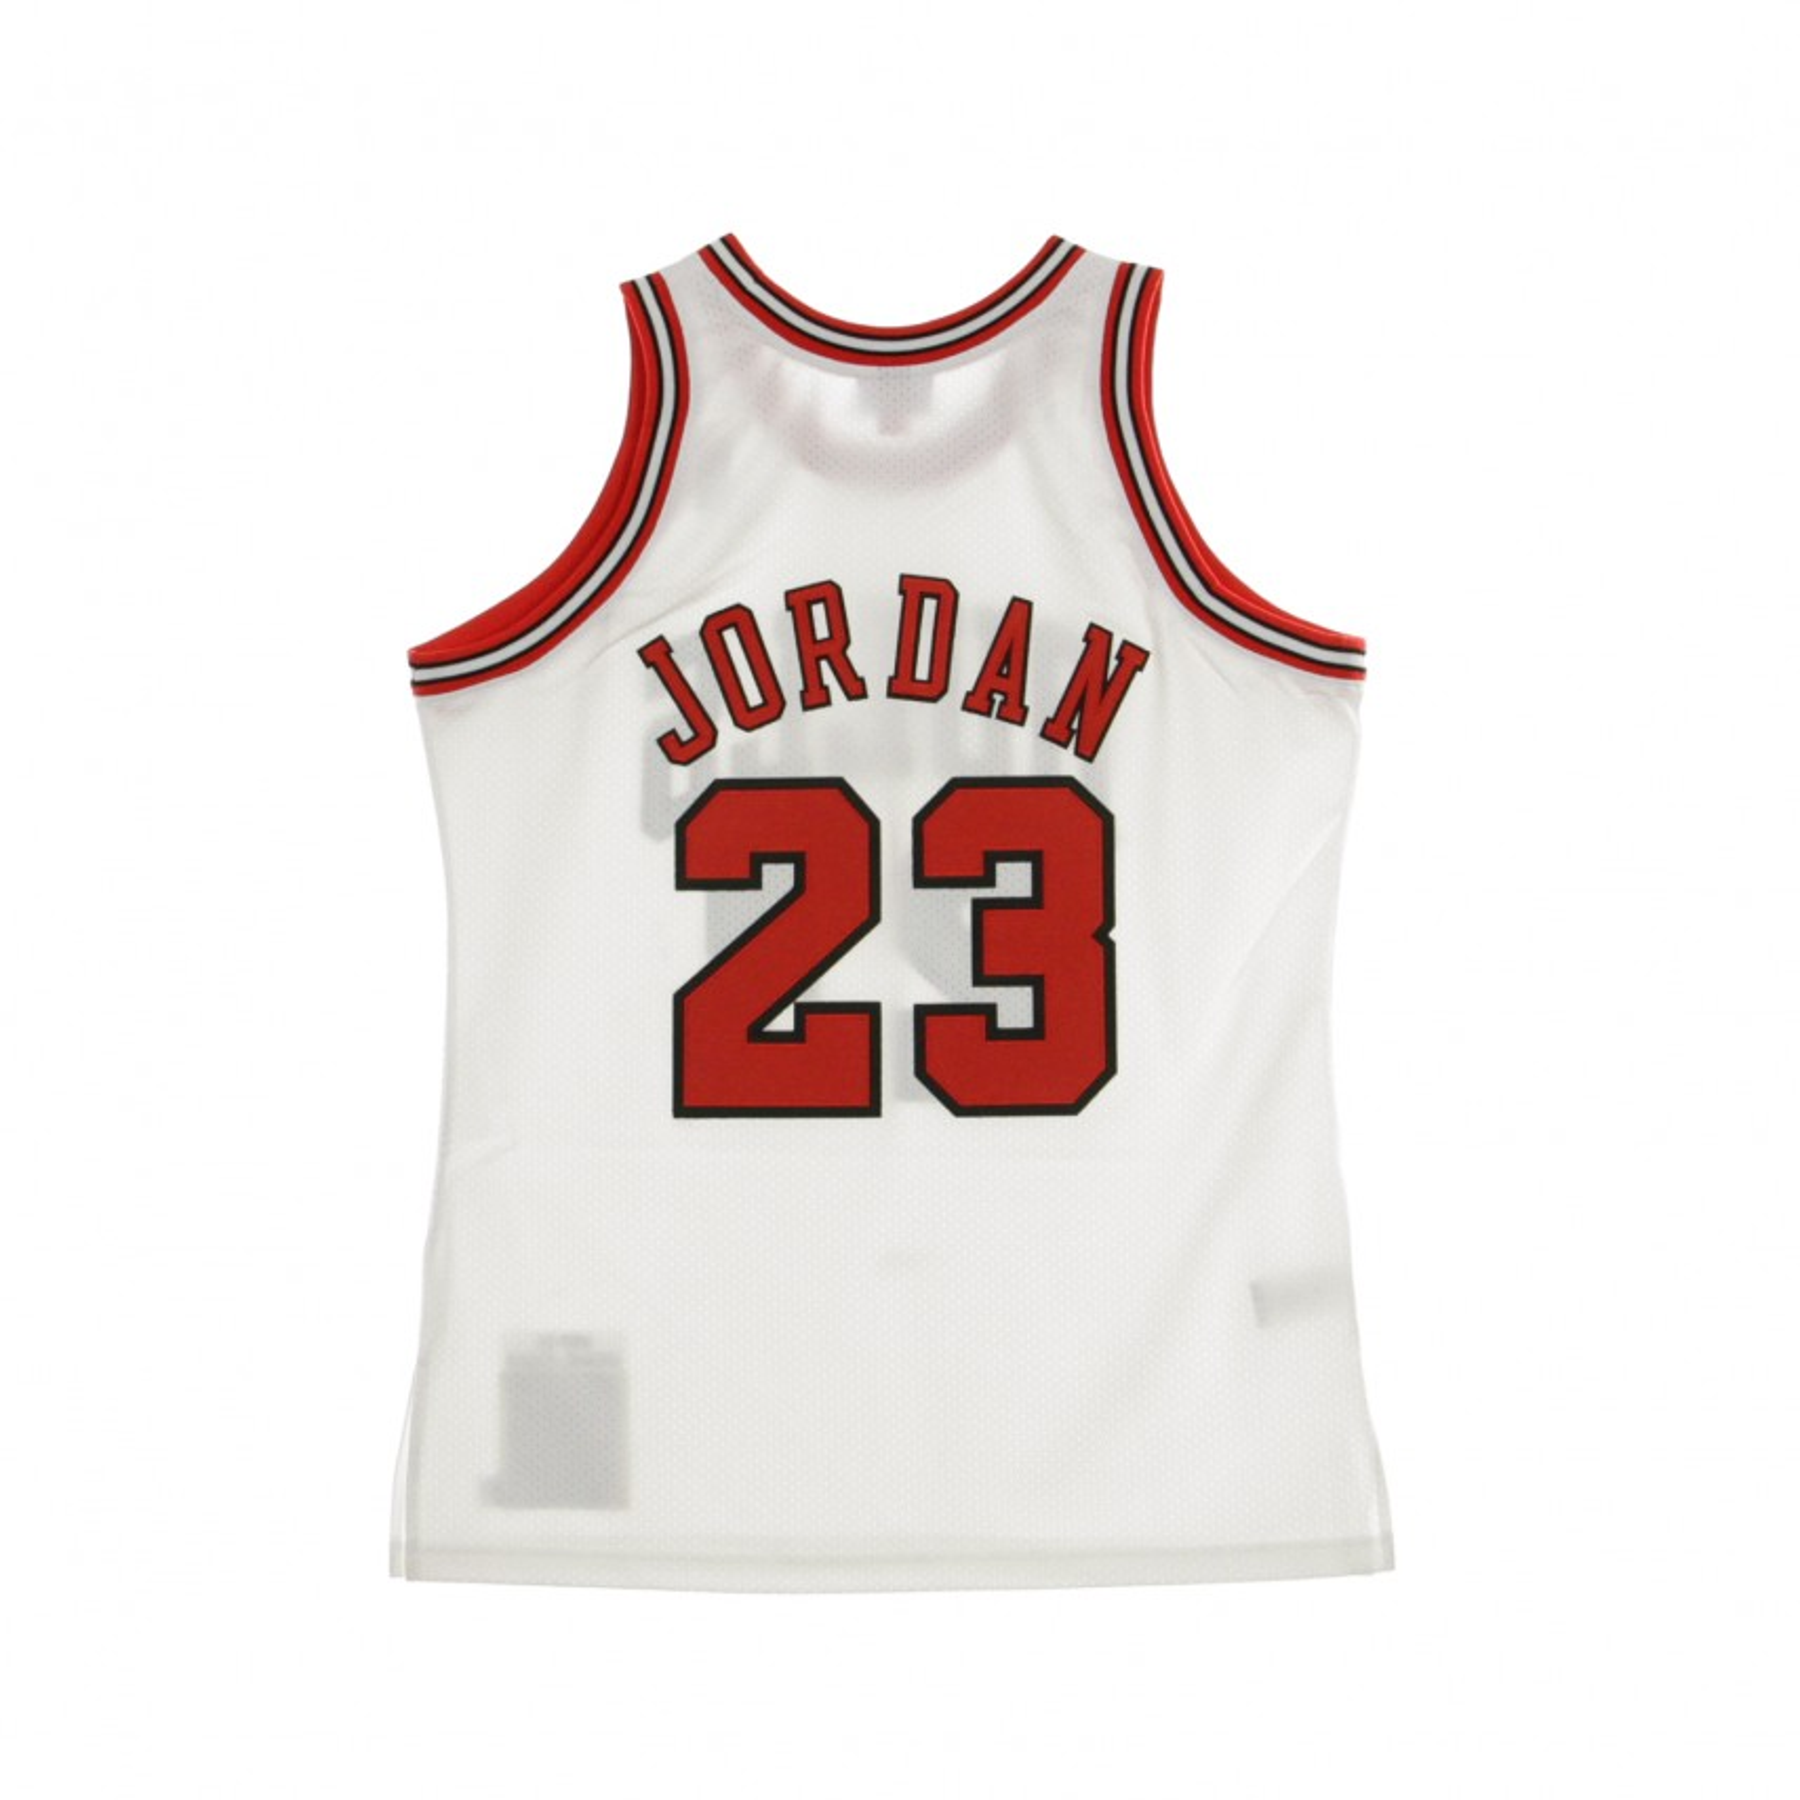 CANOTTA BASKET NBA AUTHENTIC JERSEY MICHAEL JORDAN NO23 1997-98 CHIBUL HOME